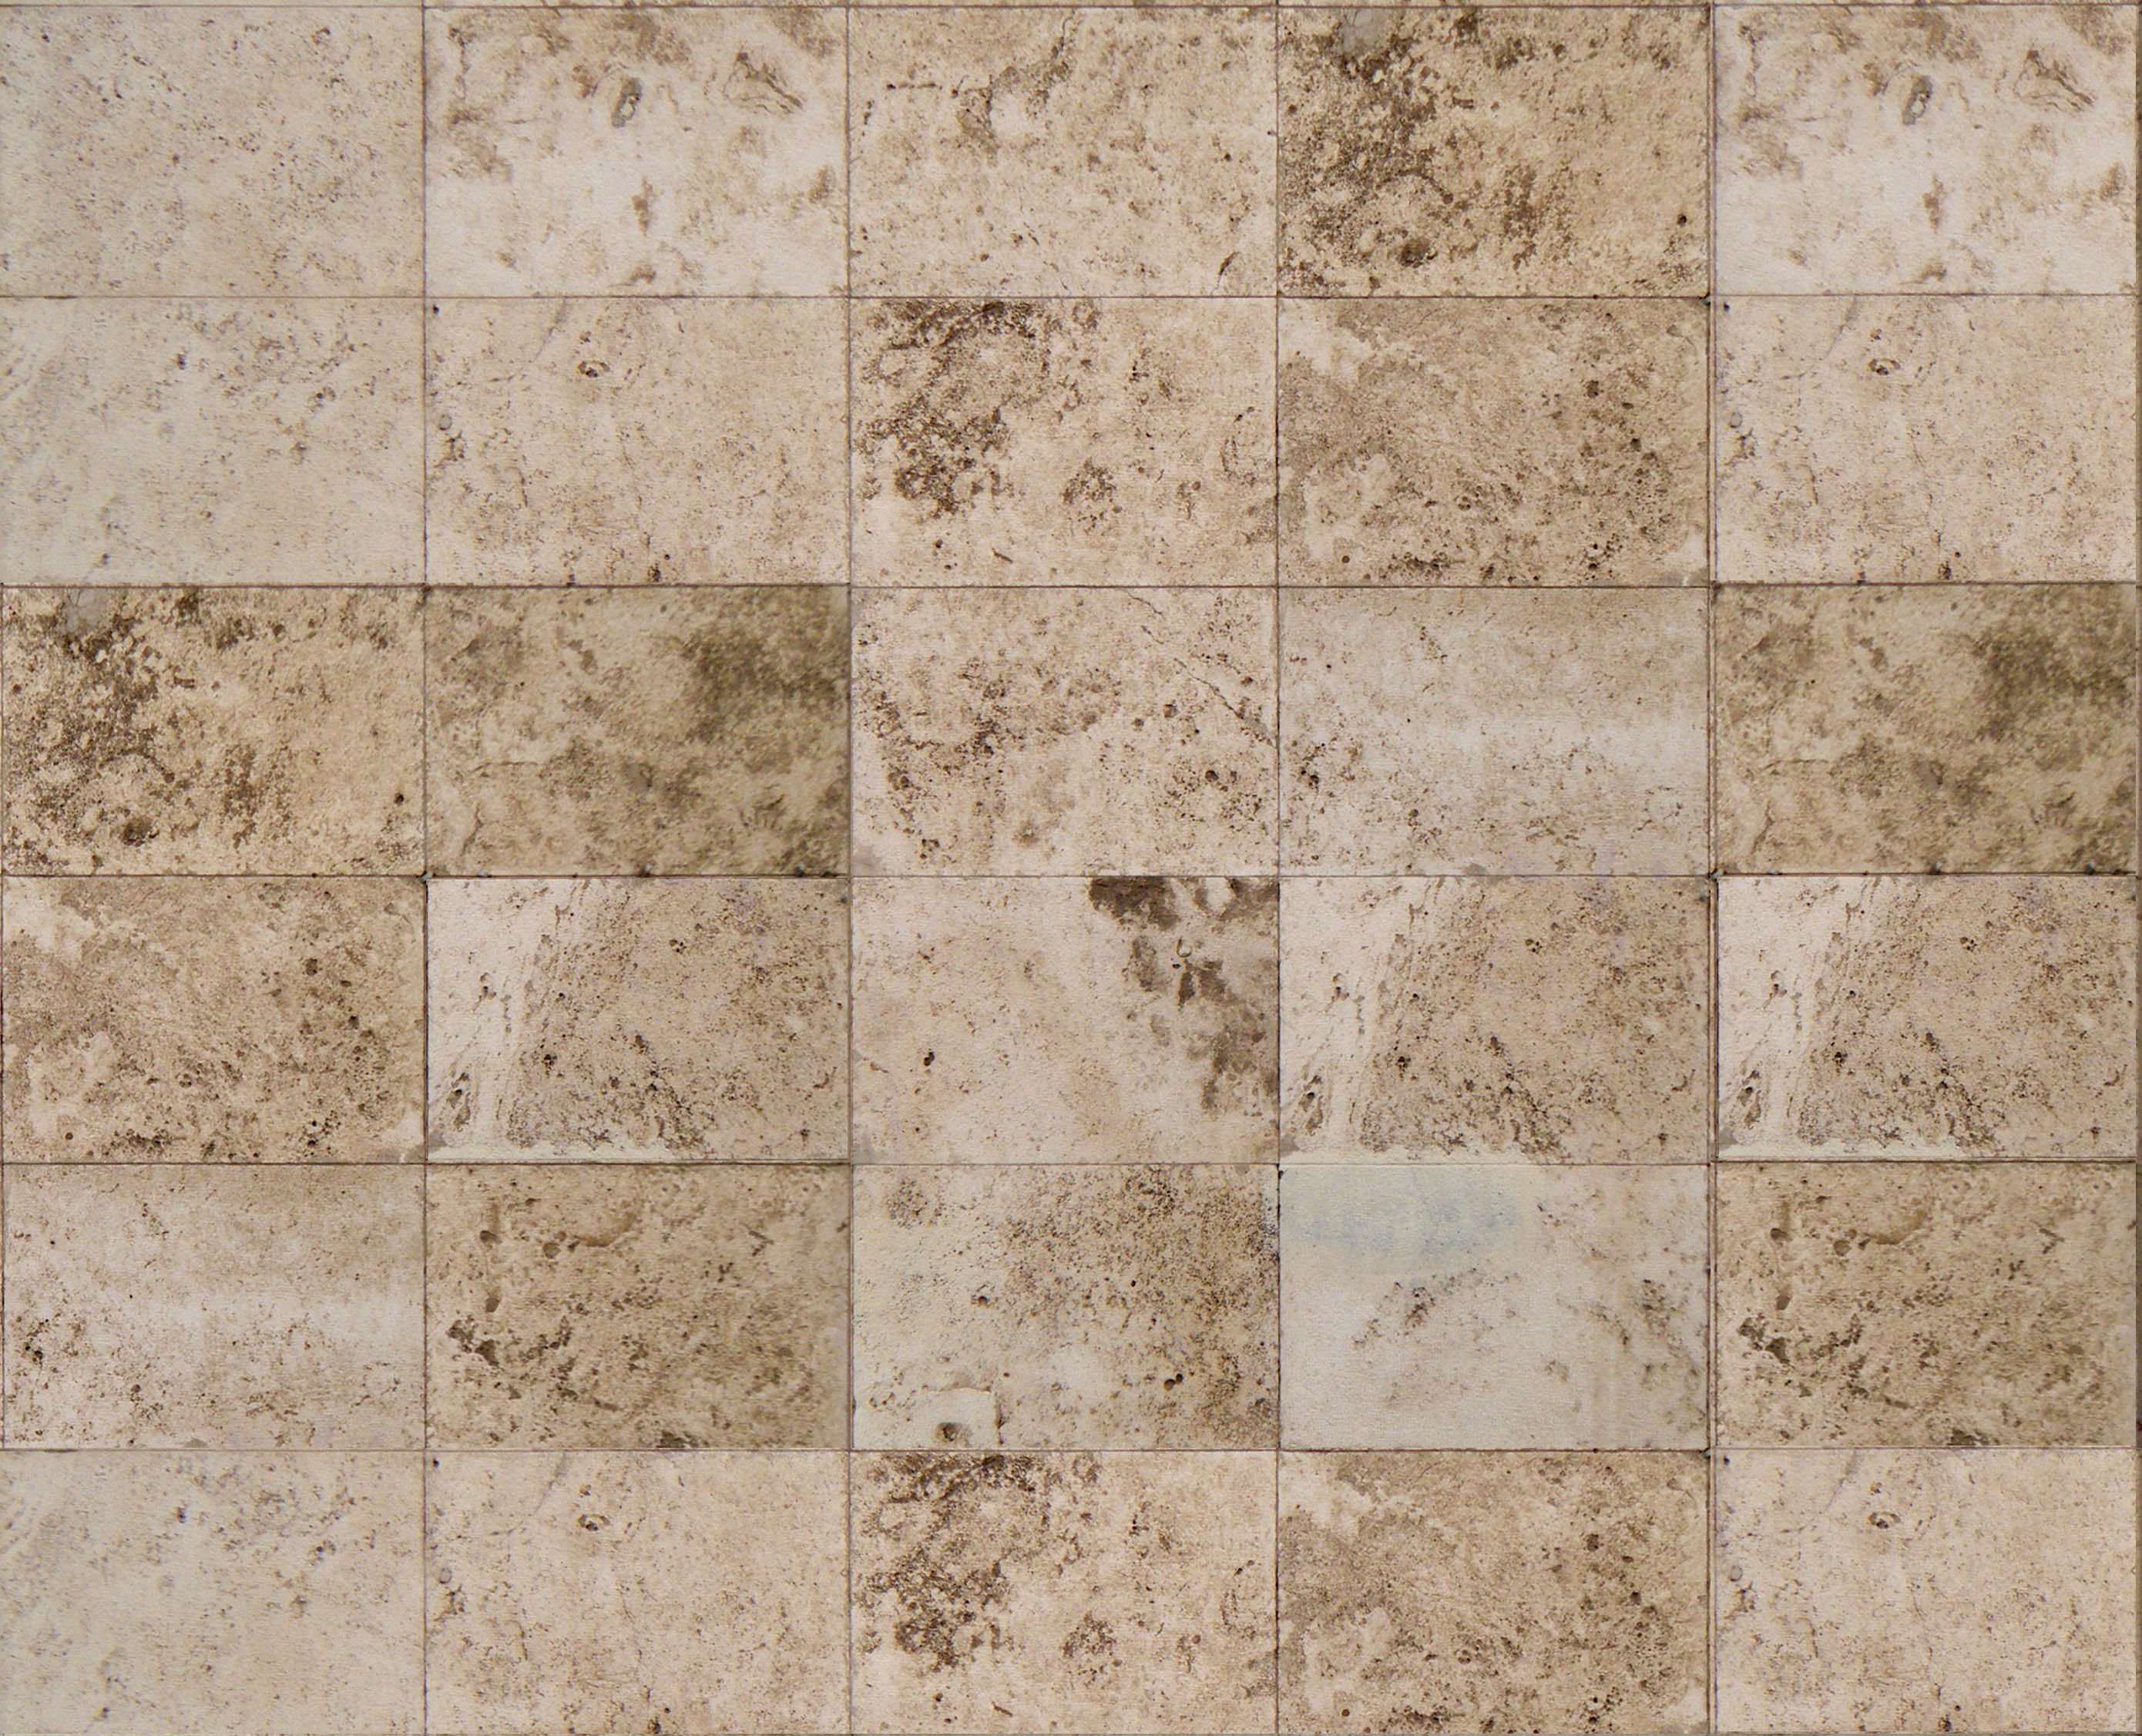 fantastic how to tile a bathroom floor image-Beautiful How to Tile A Bathroom Floor Decoration